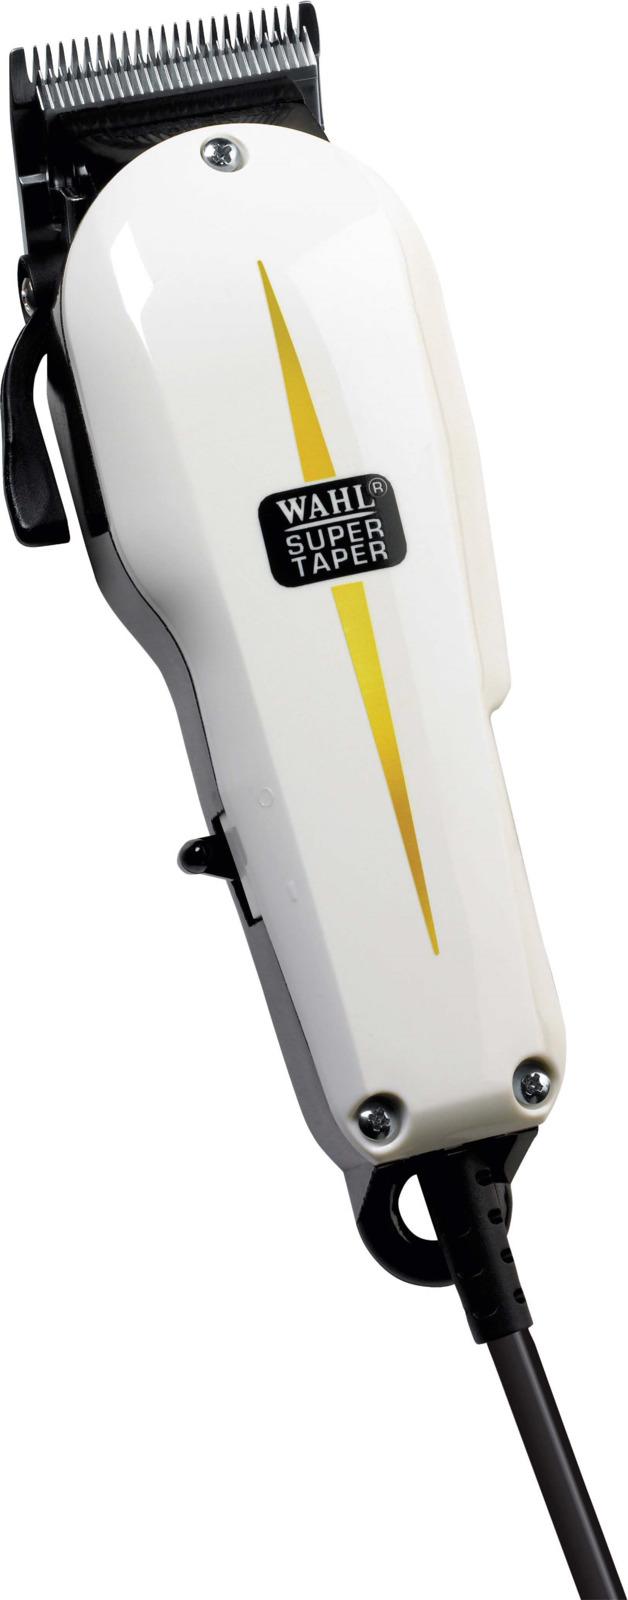 Машинка для стрижки Wahl 8466-216H (4008-0480) Super Taper машинка для стрижки wahl show pro с ножом на винтах